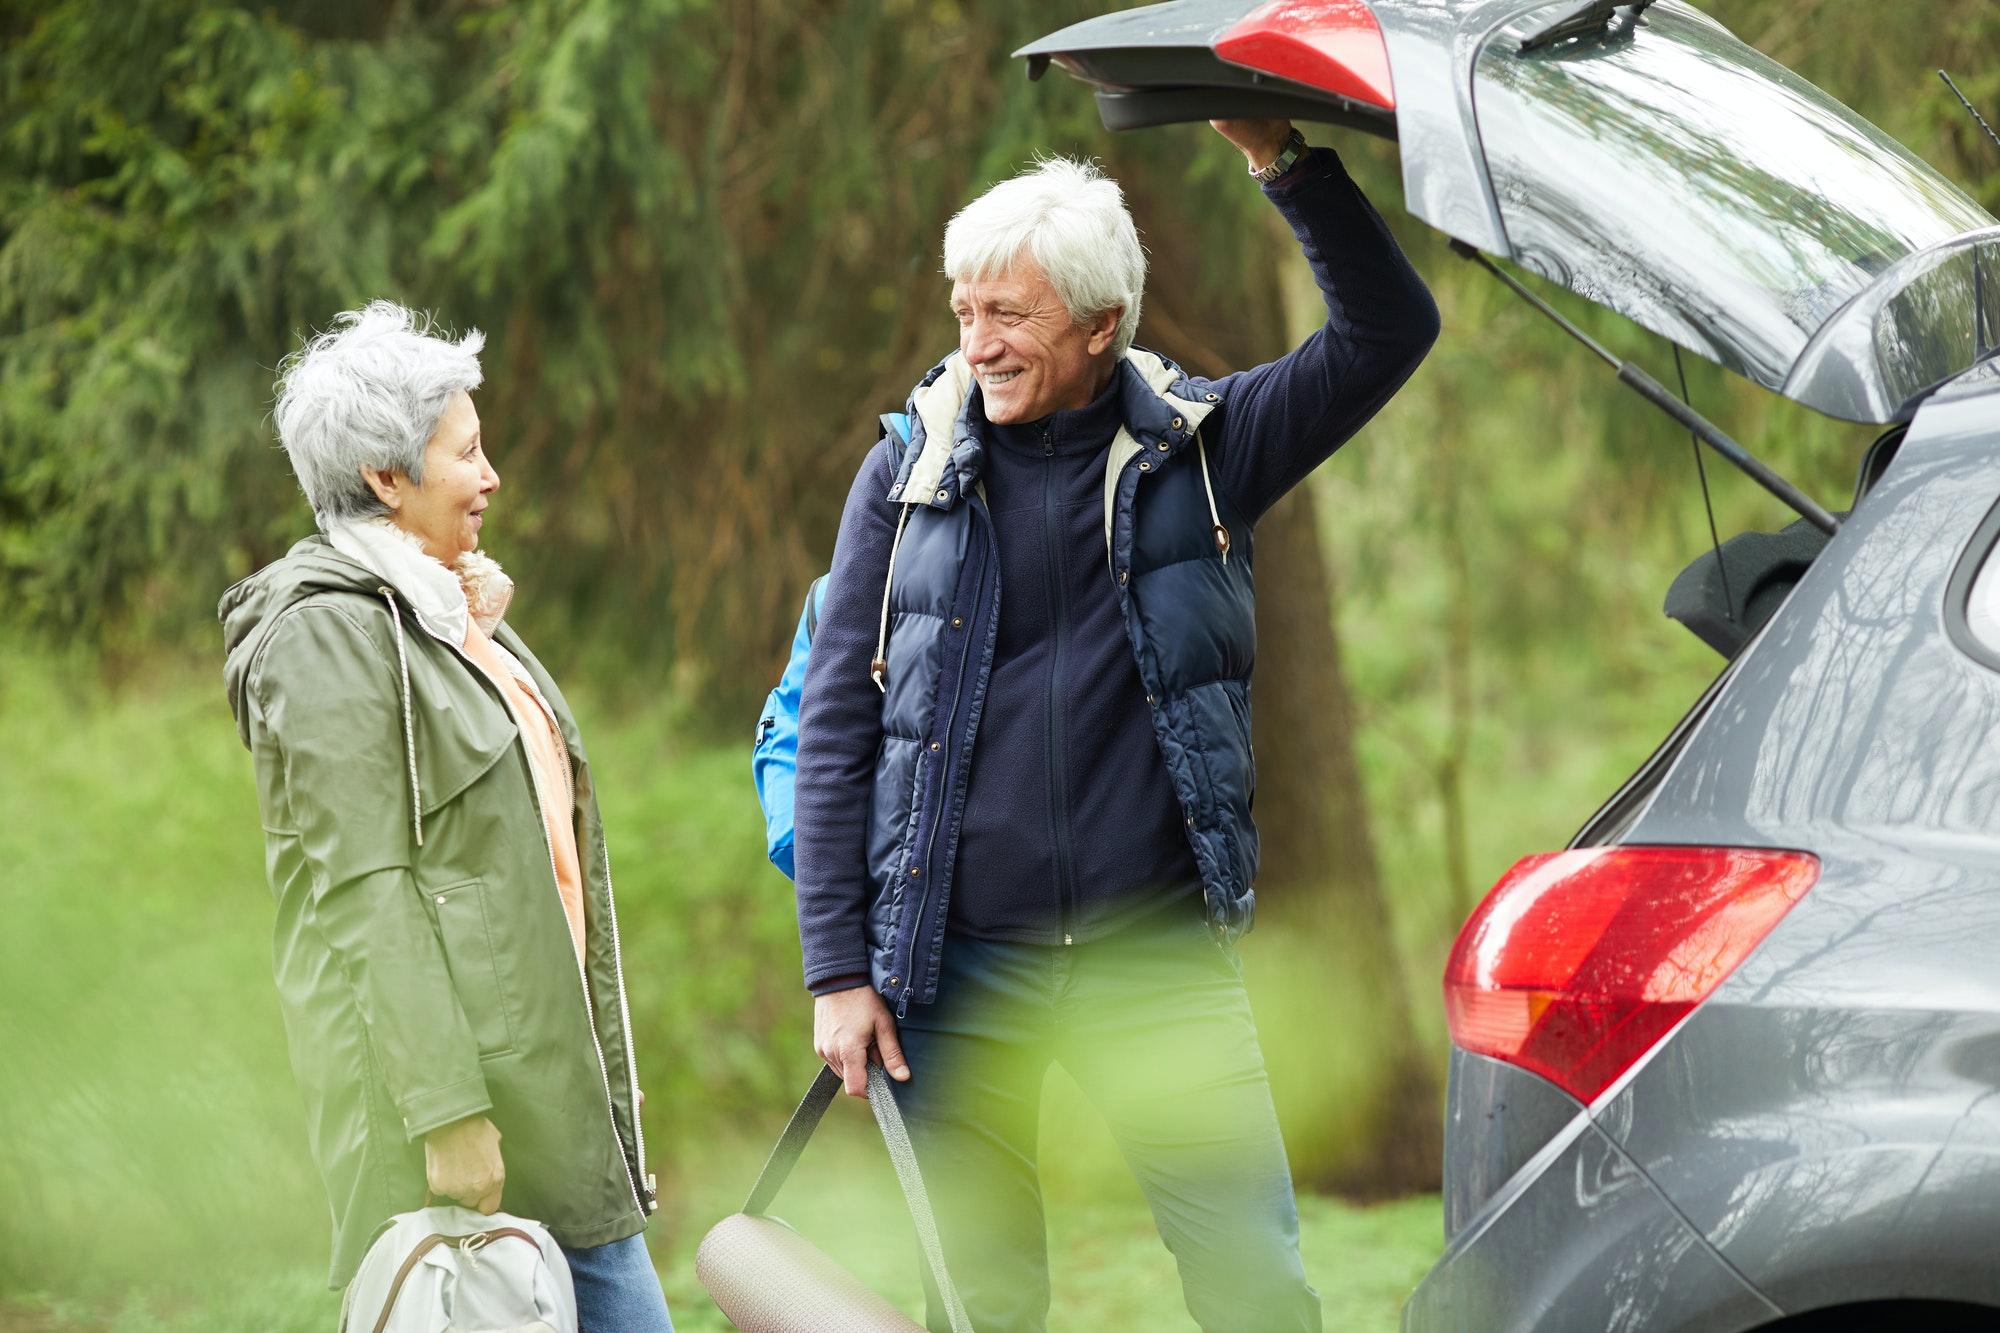 Active Senior Couple by Car